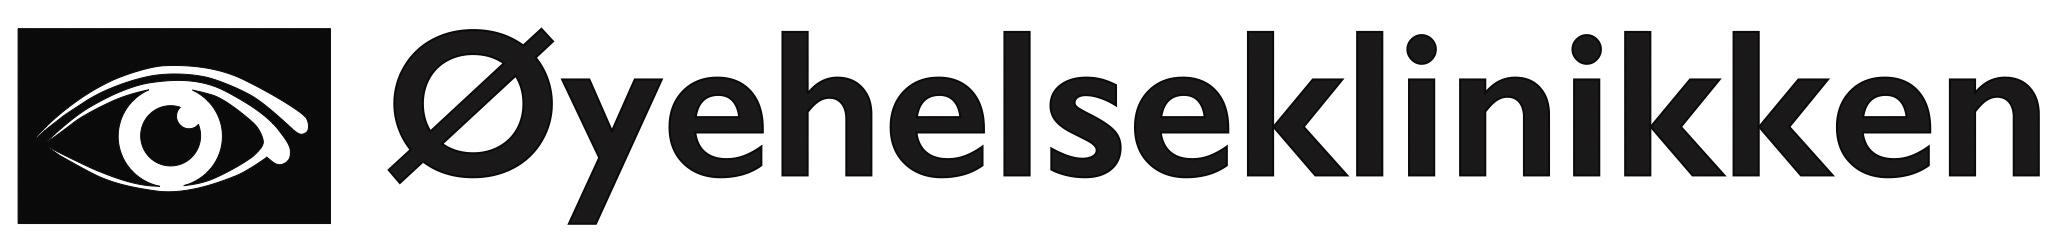 ØYEHELSEKLINIKKEN sin logo